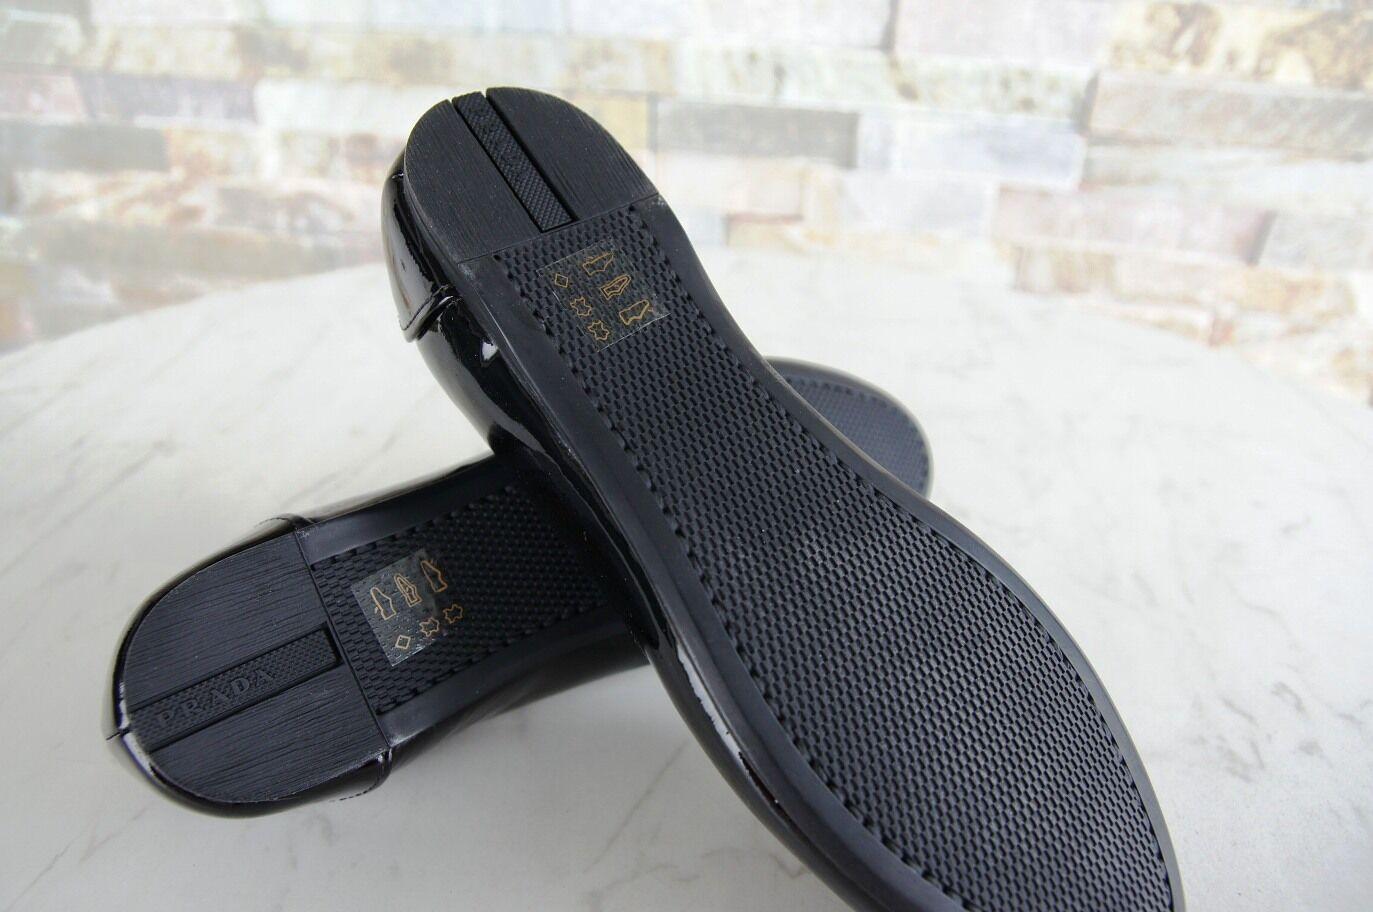 PRADA TAGLIA SCARPE 36 BALLERINE SLIPPER SCARPE TAGLIA BASSE VERNICE Scarpe in pelle nero NUOVO UVP e9ce10